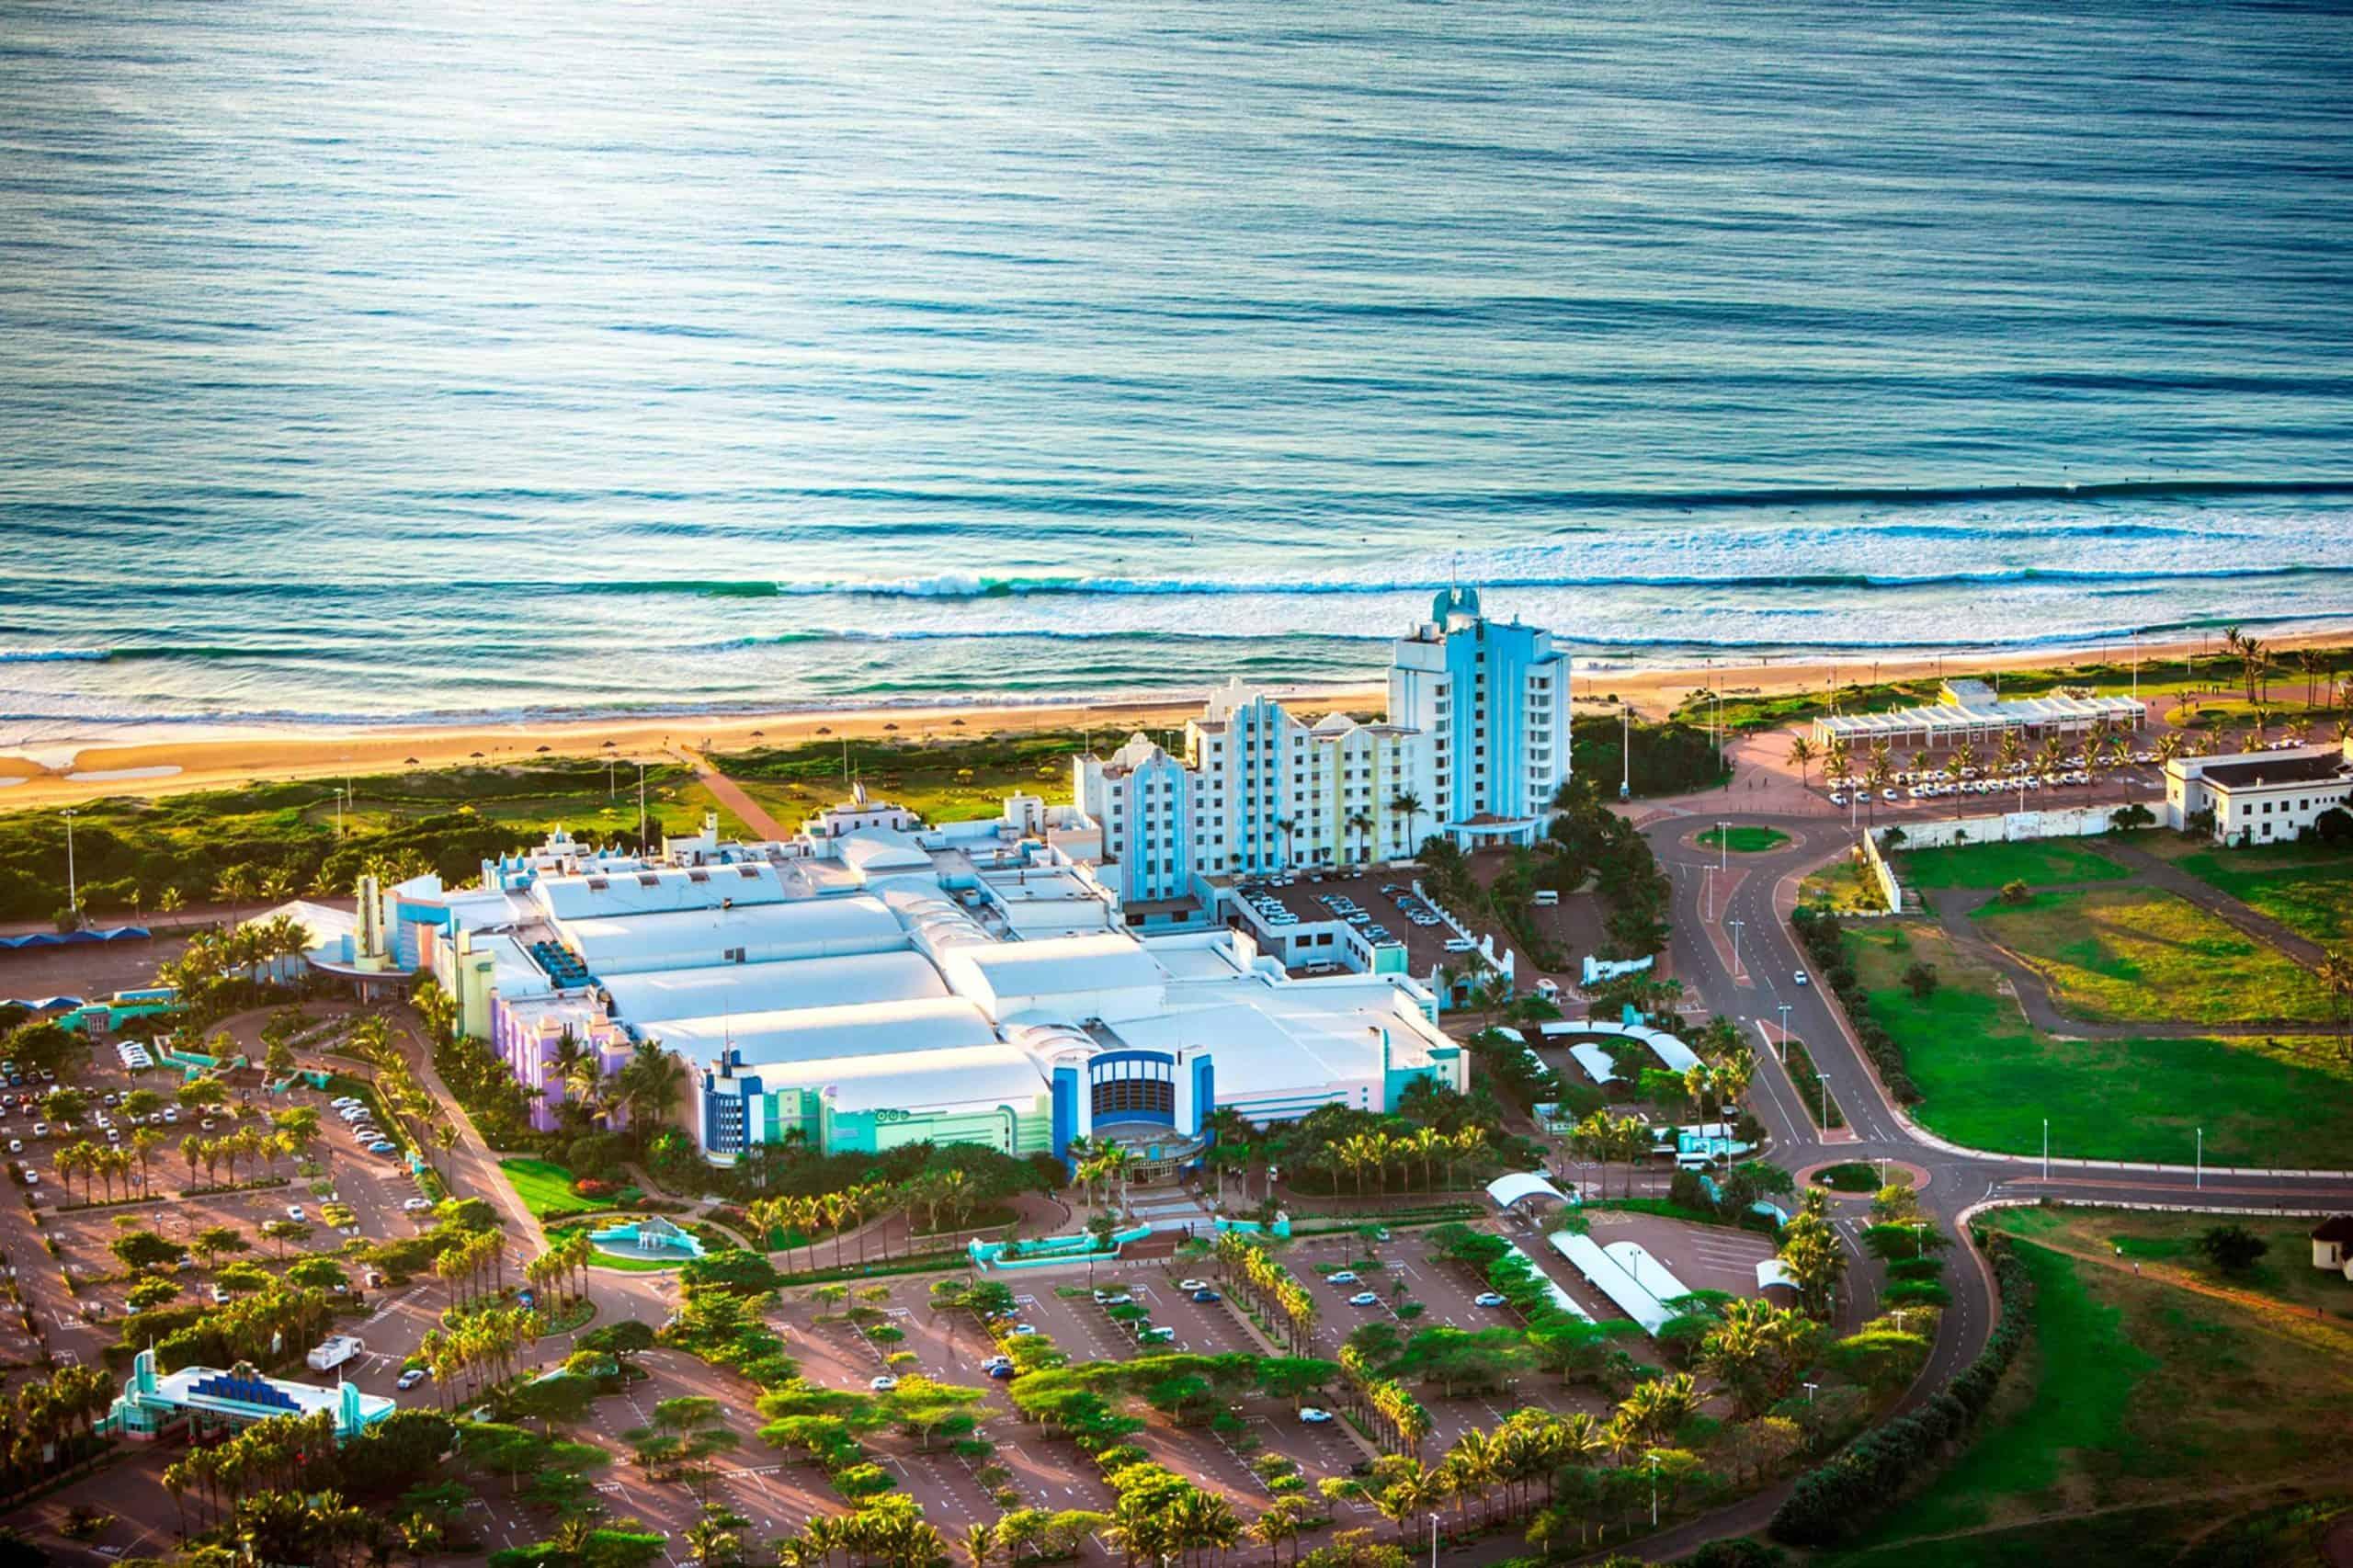 Suncoast Casino Aerial view